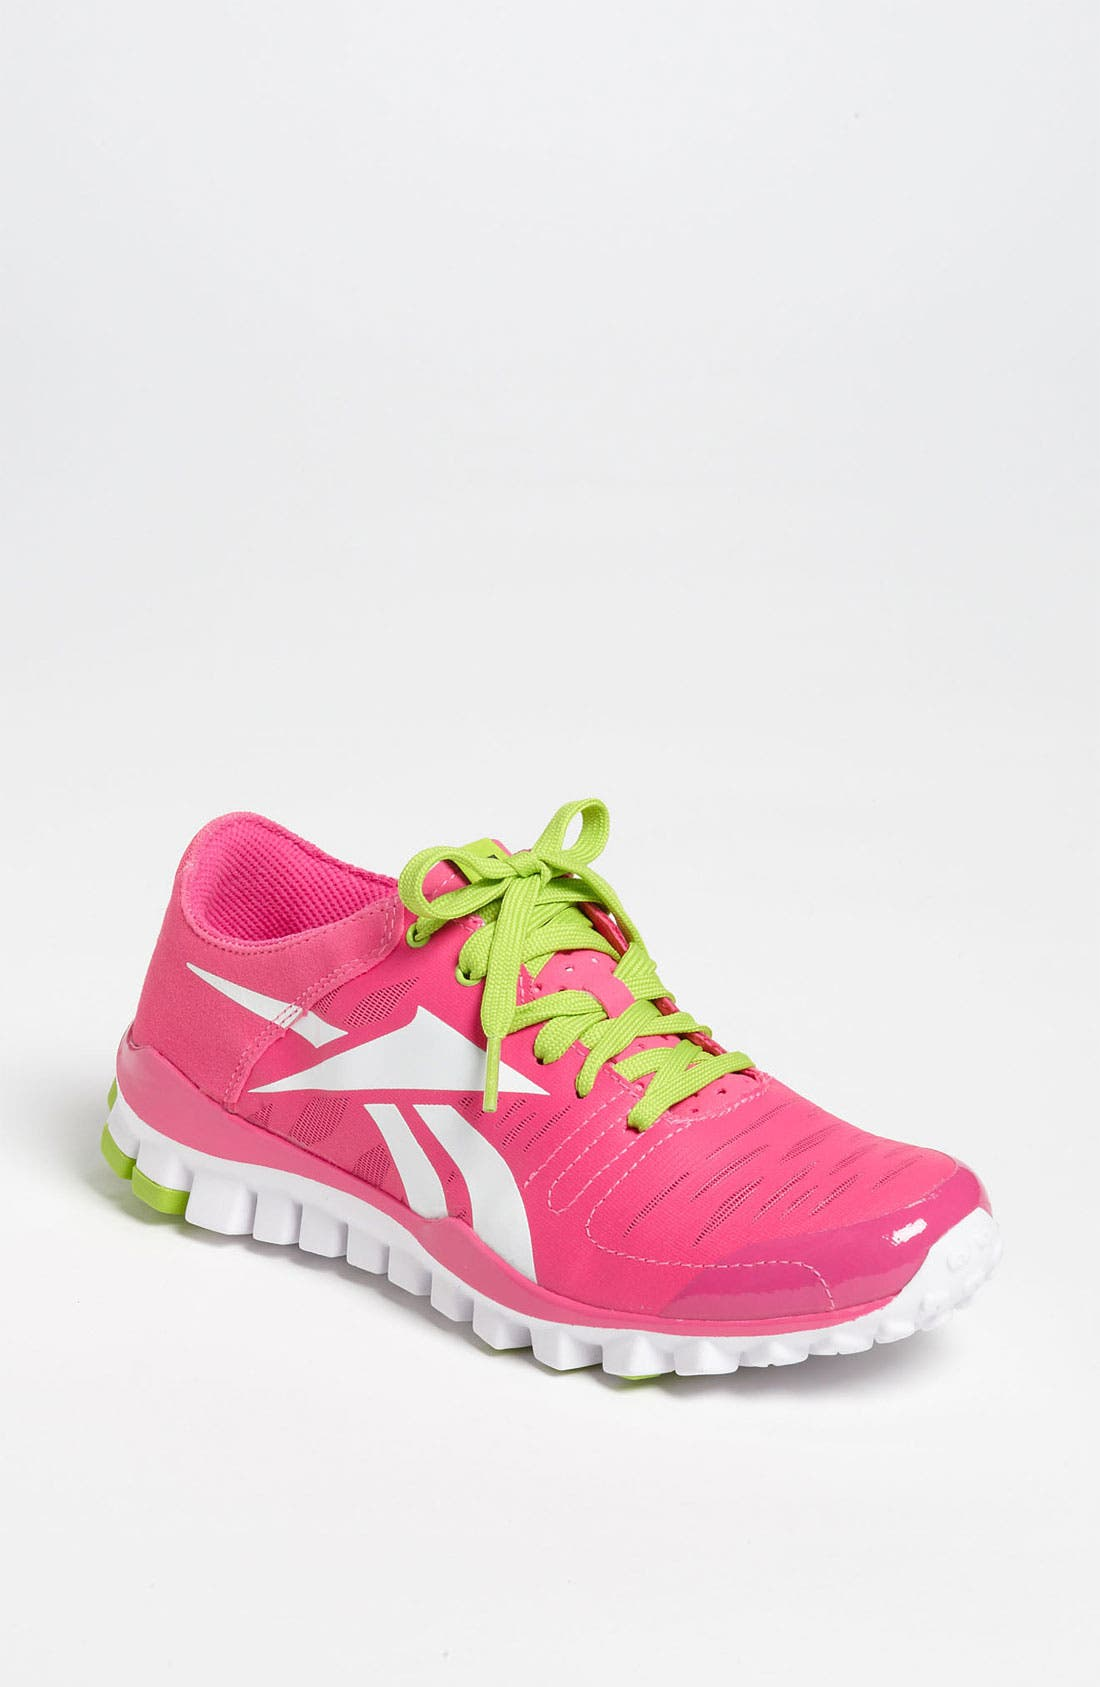 Alternate Image 1 Selected - Reebok 'RealFlex Fusion' Training Shoe (Women)